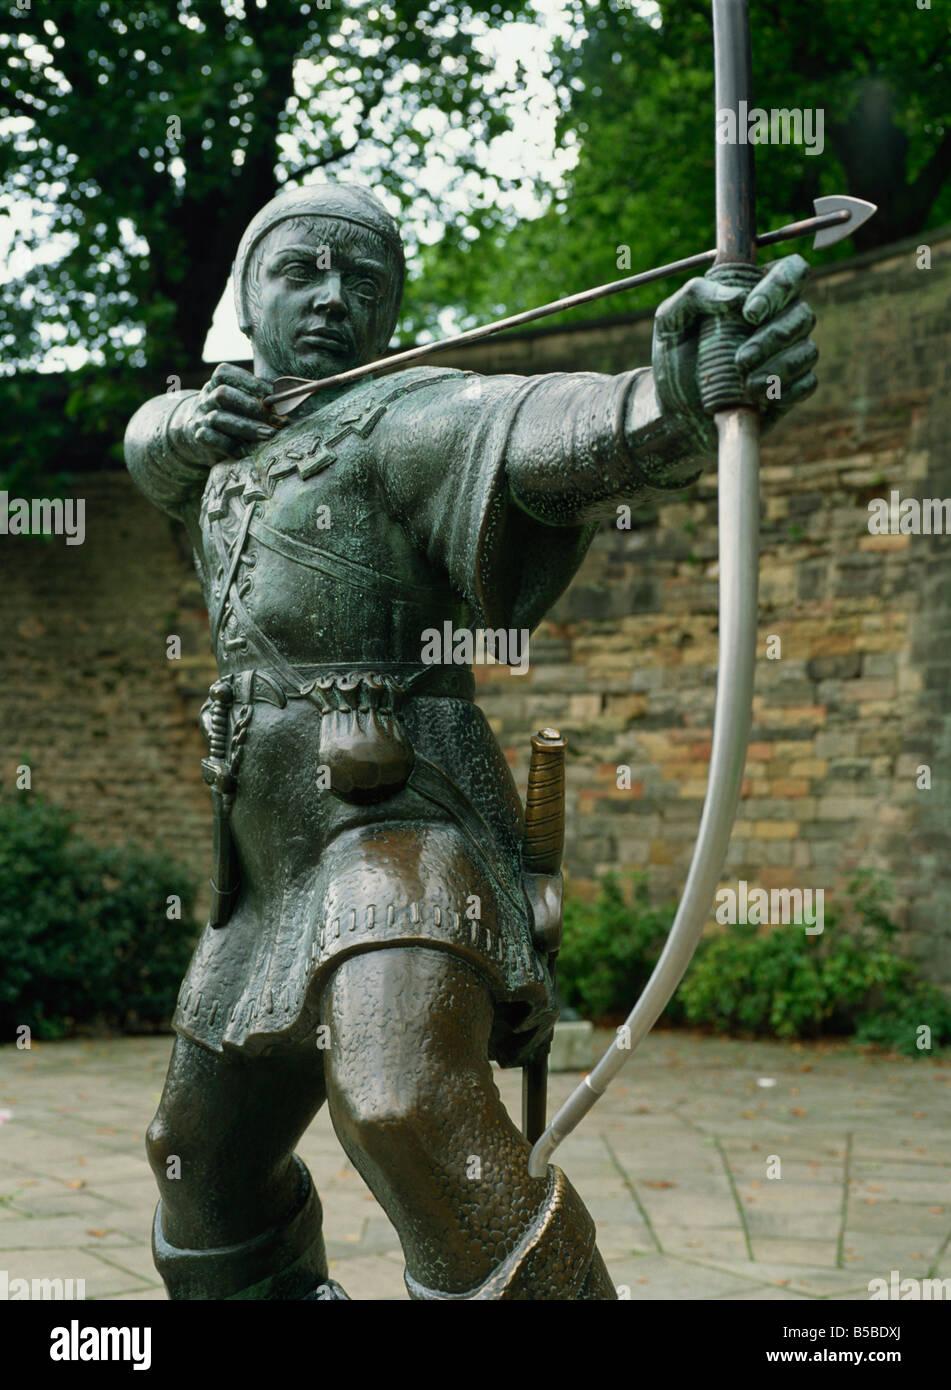 Statue of Robin Hood, Nottingham, Nottinghamshire, England, Europe - Stock Image